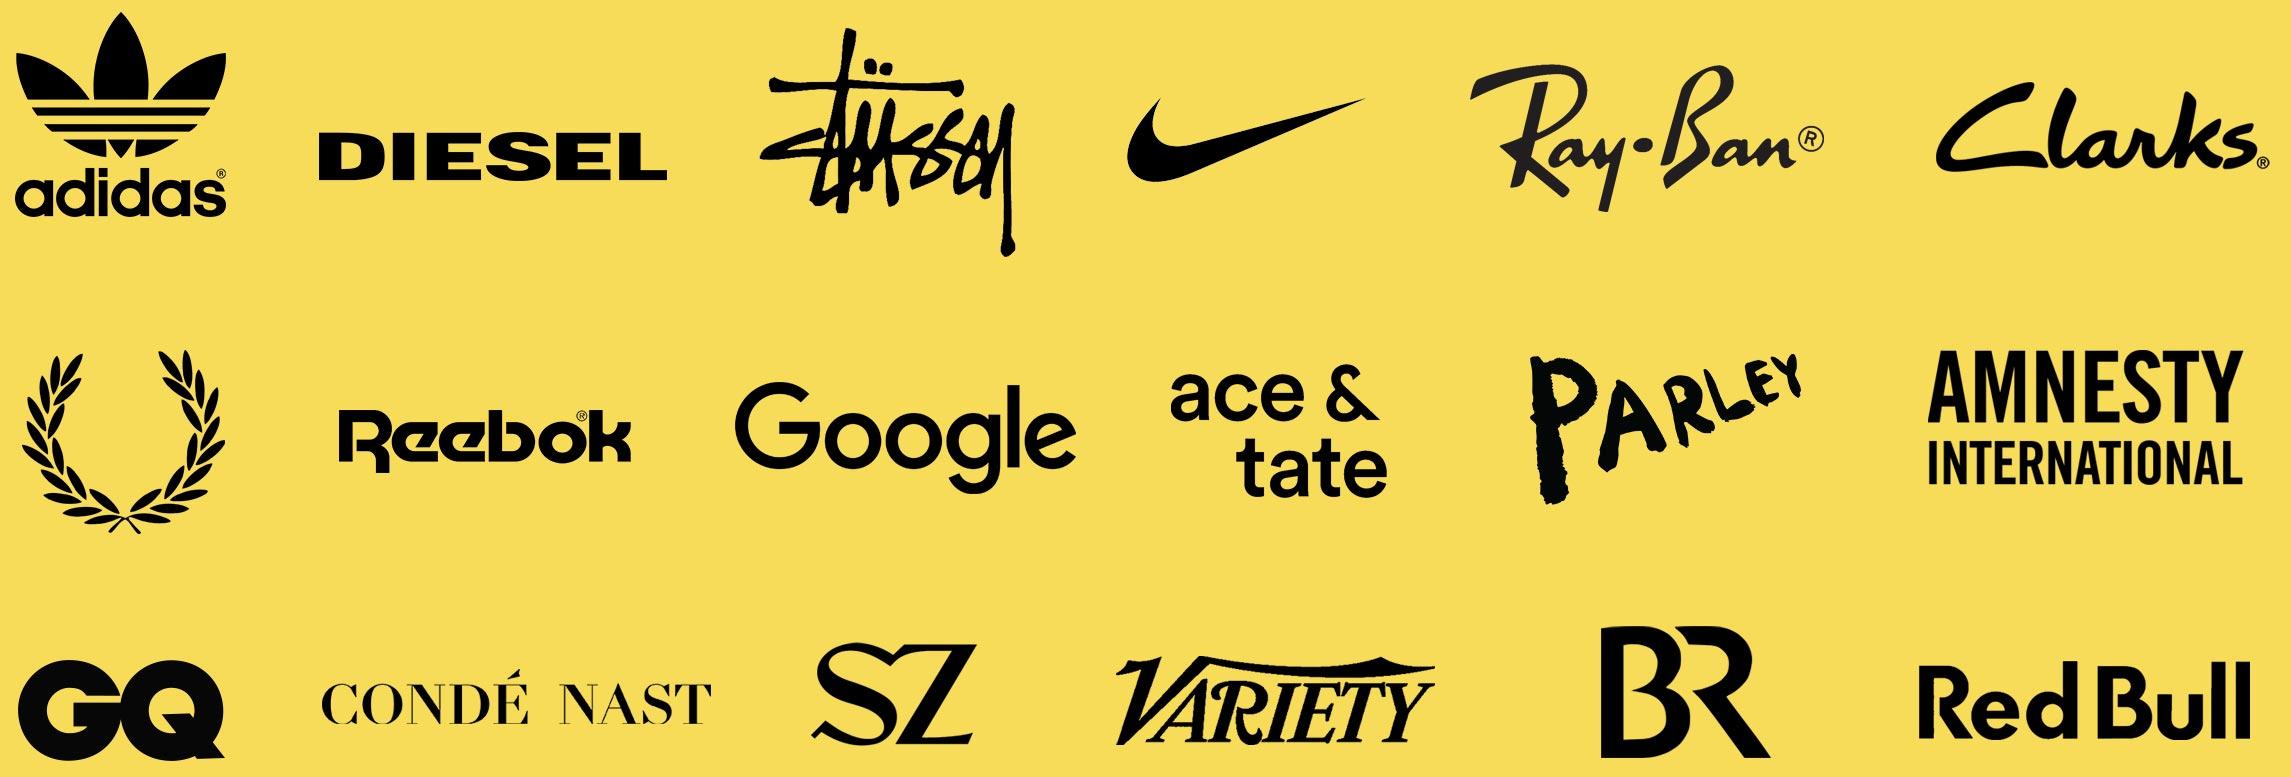 Gabe_Client_Logos